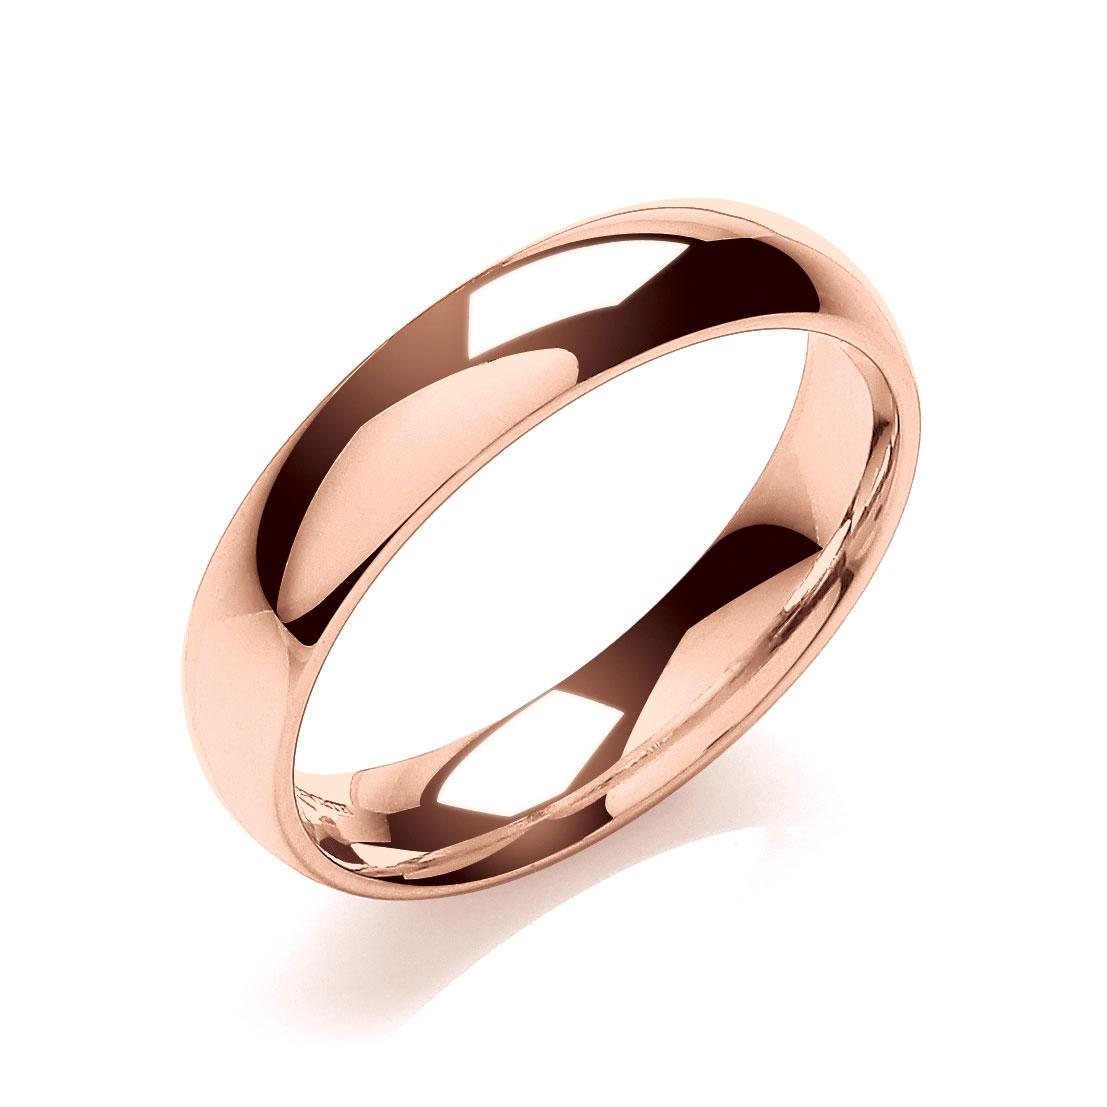 151eb7211 5mm 18 Carat Rose Gold Gents Medium Weight Court Wedding Band - Gents  Wedding Bands - Wedding Rings